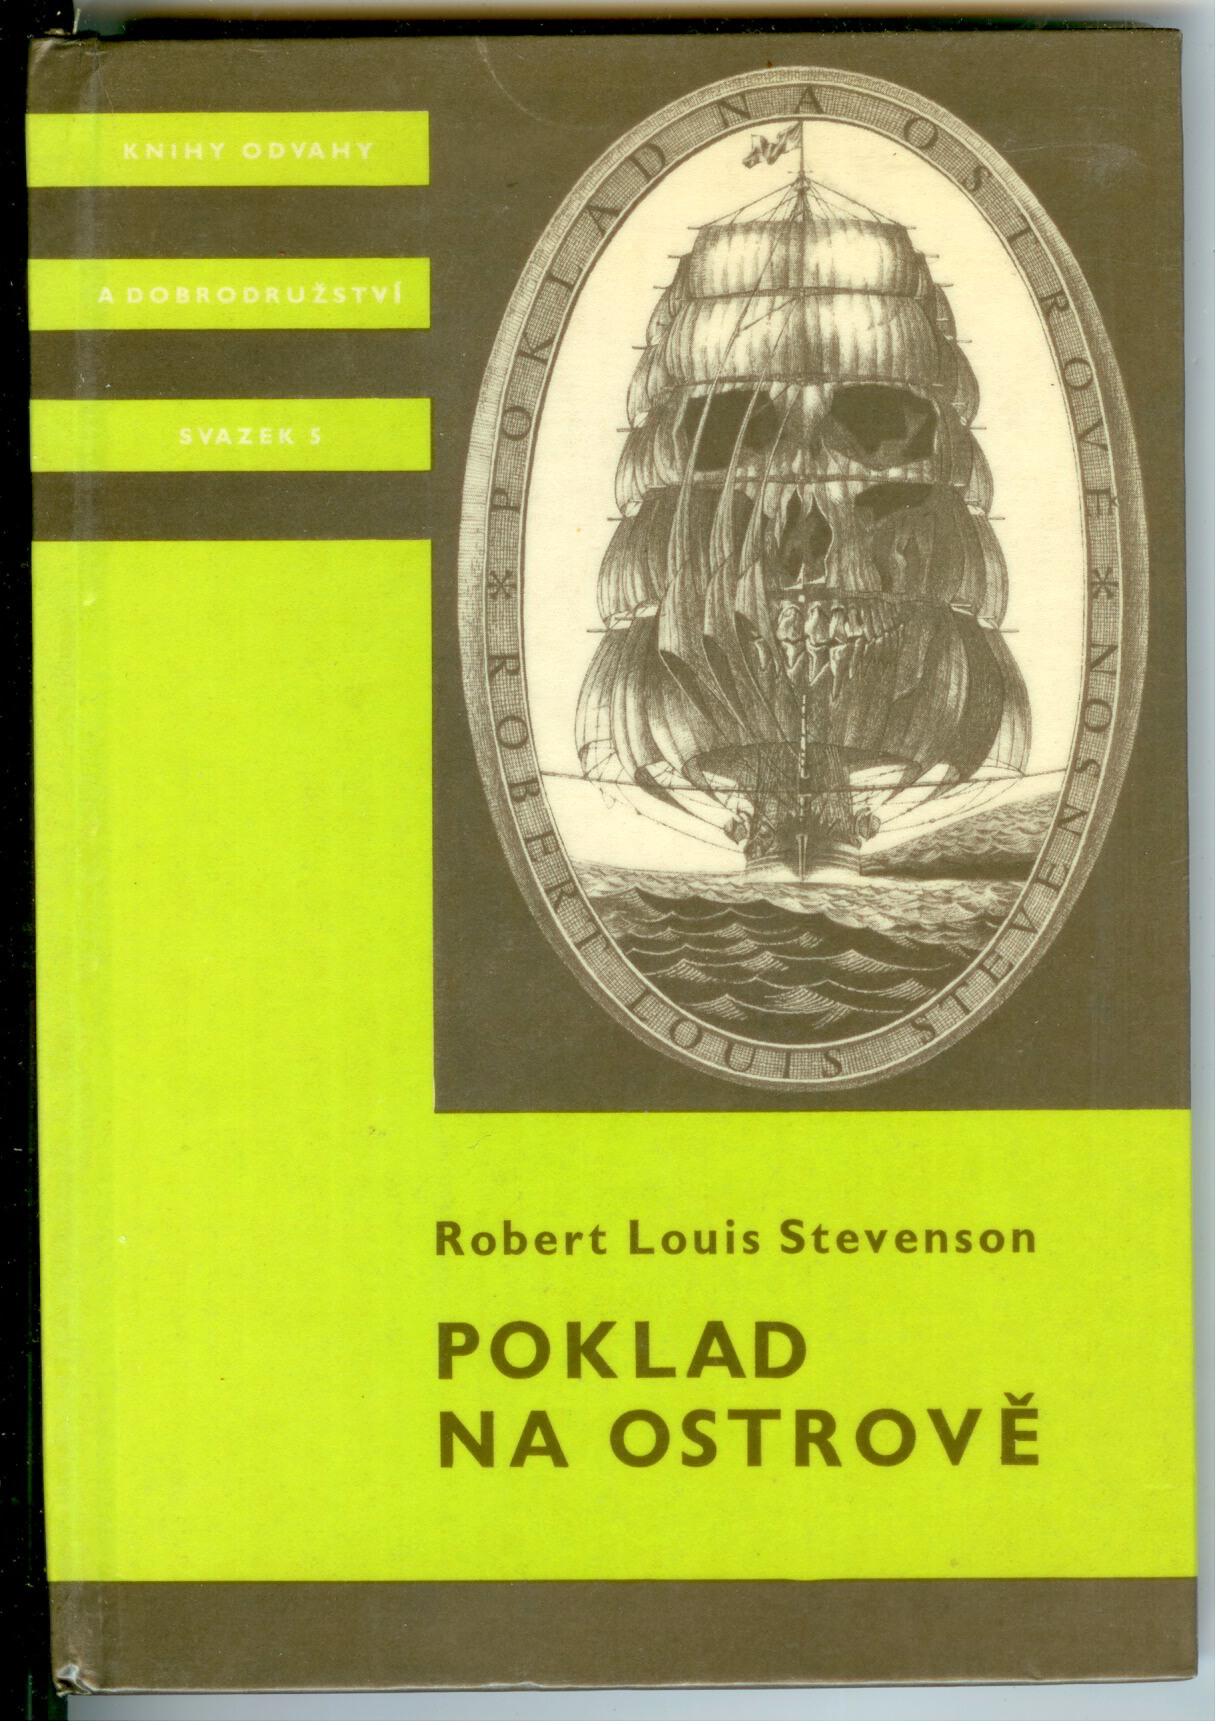 Poklad na ostrově - Robert Louis Stevenson (KOD)